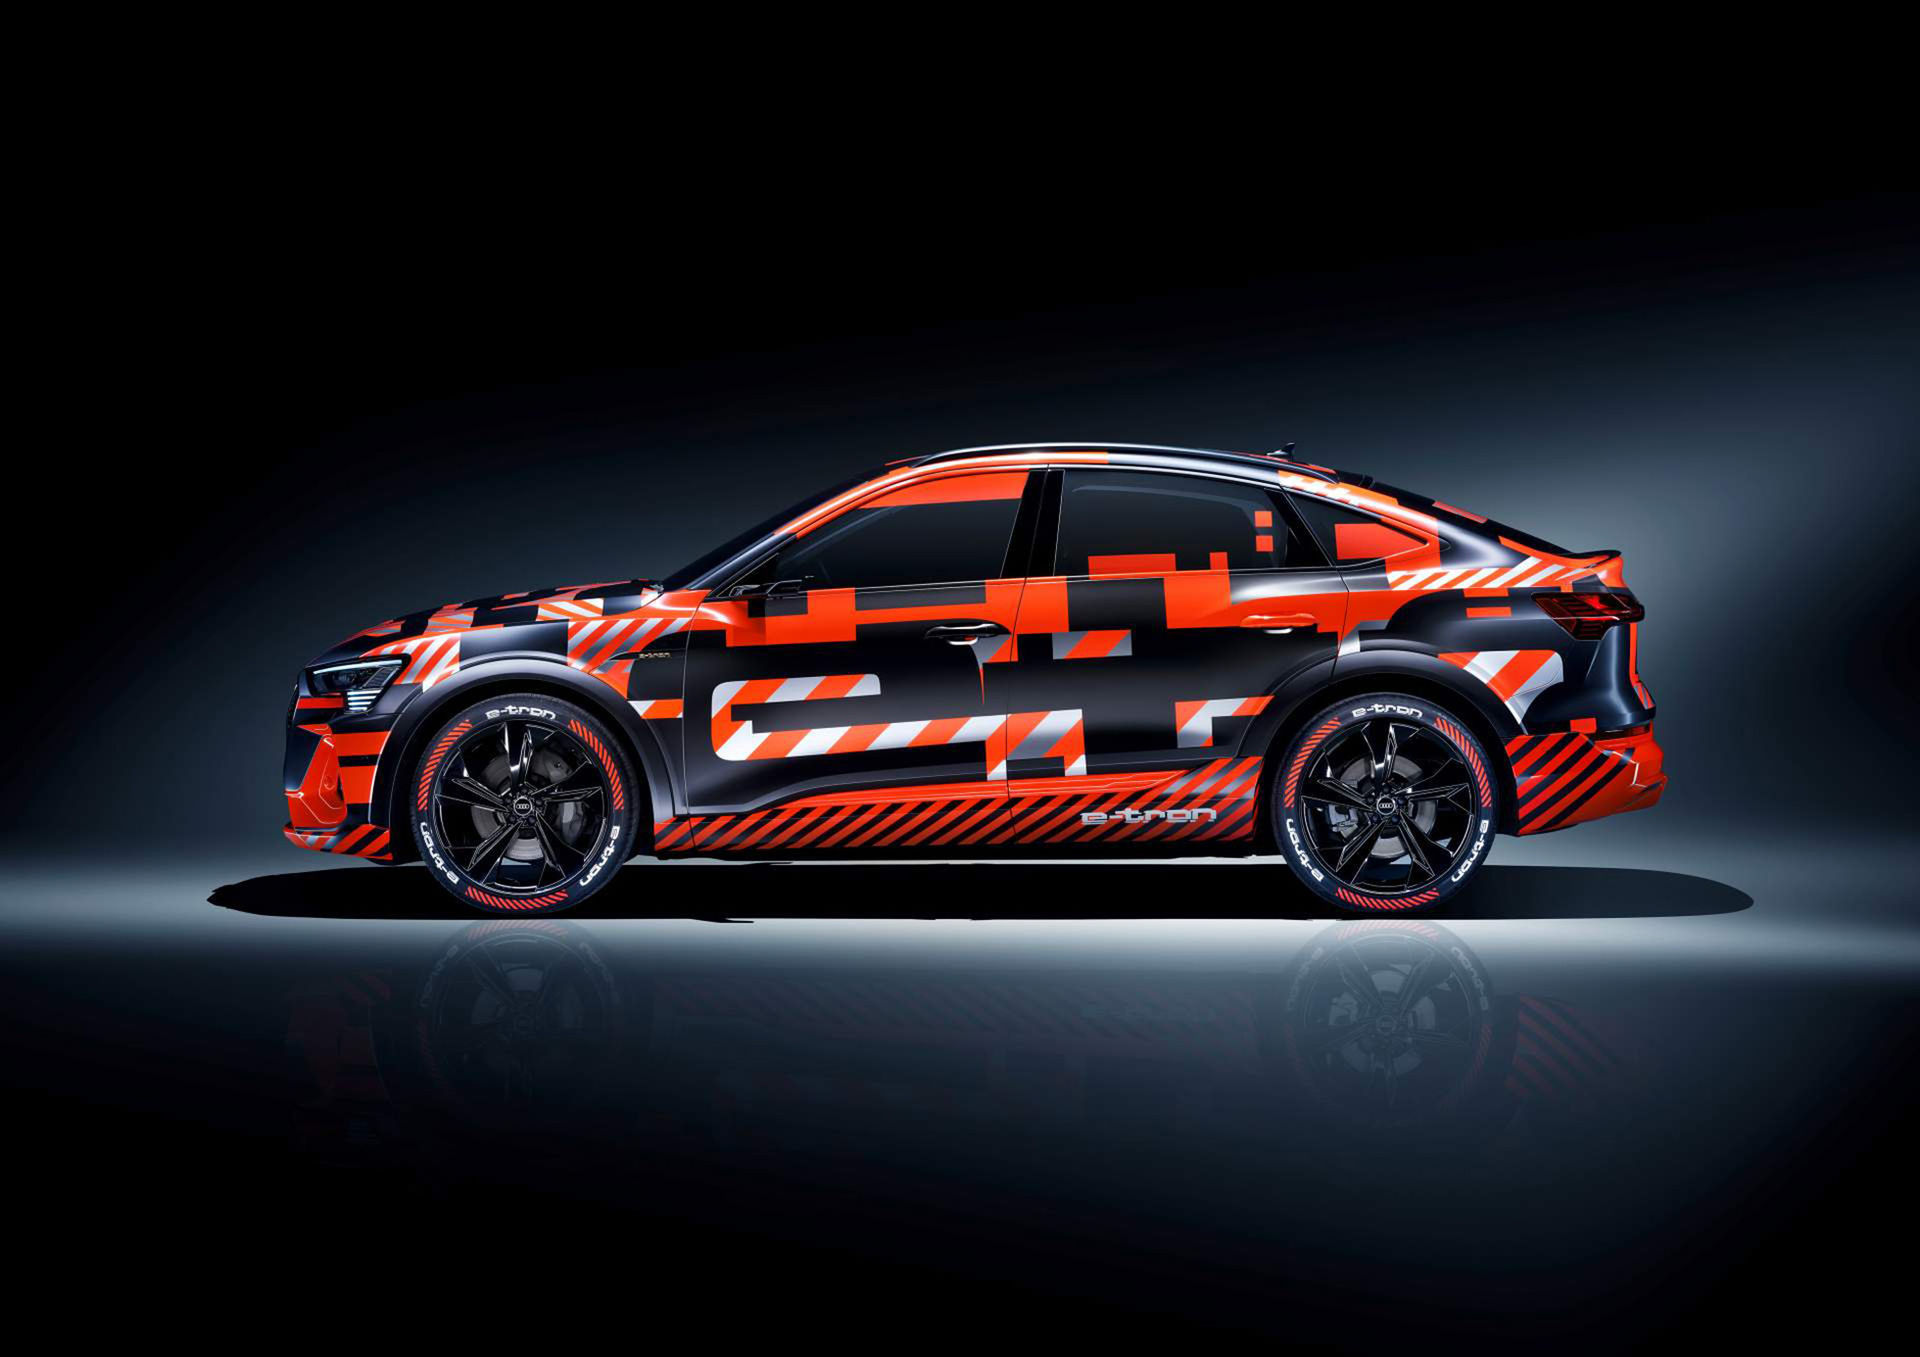 Audi e-tron med slankare profil